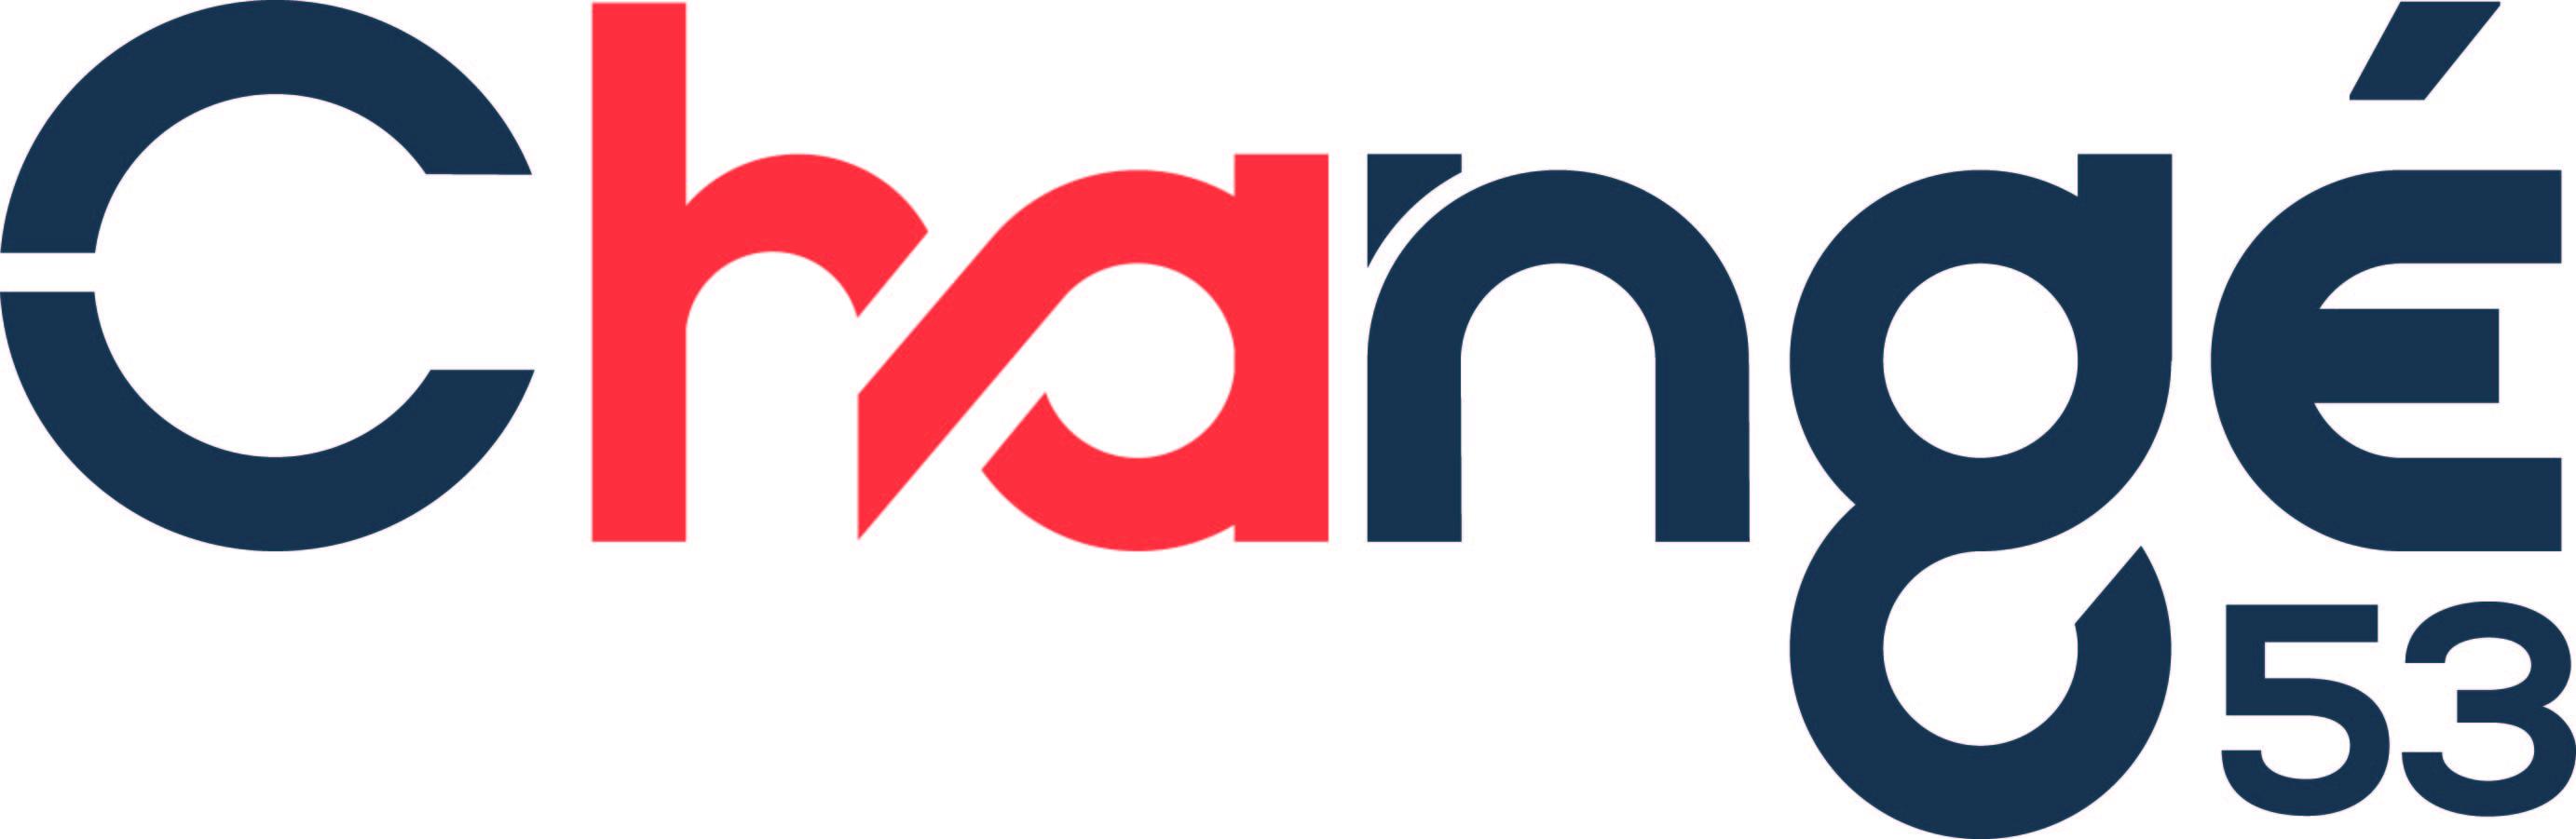 logo_change53_fblanc